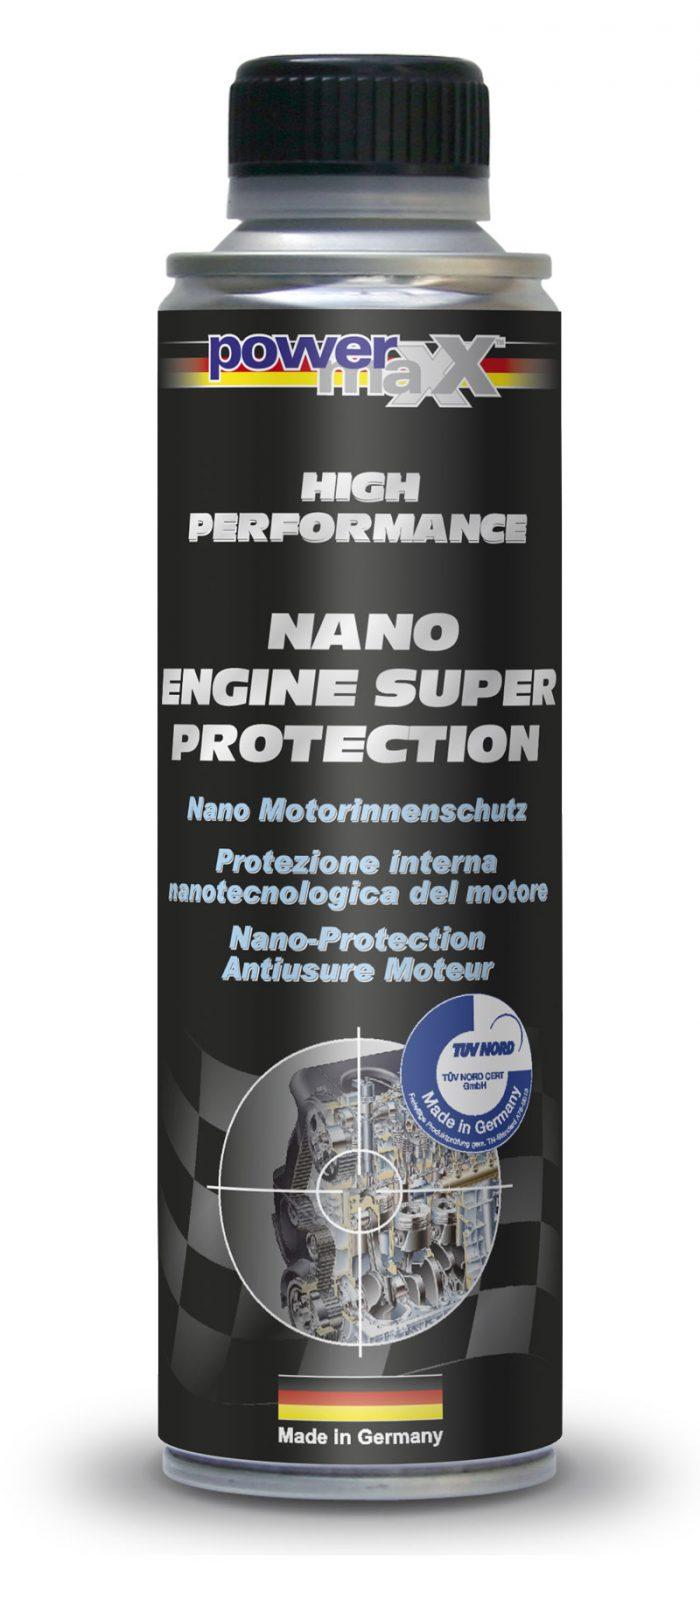 Nano-Engine-Super-Protections